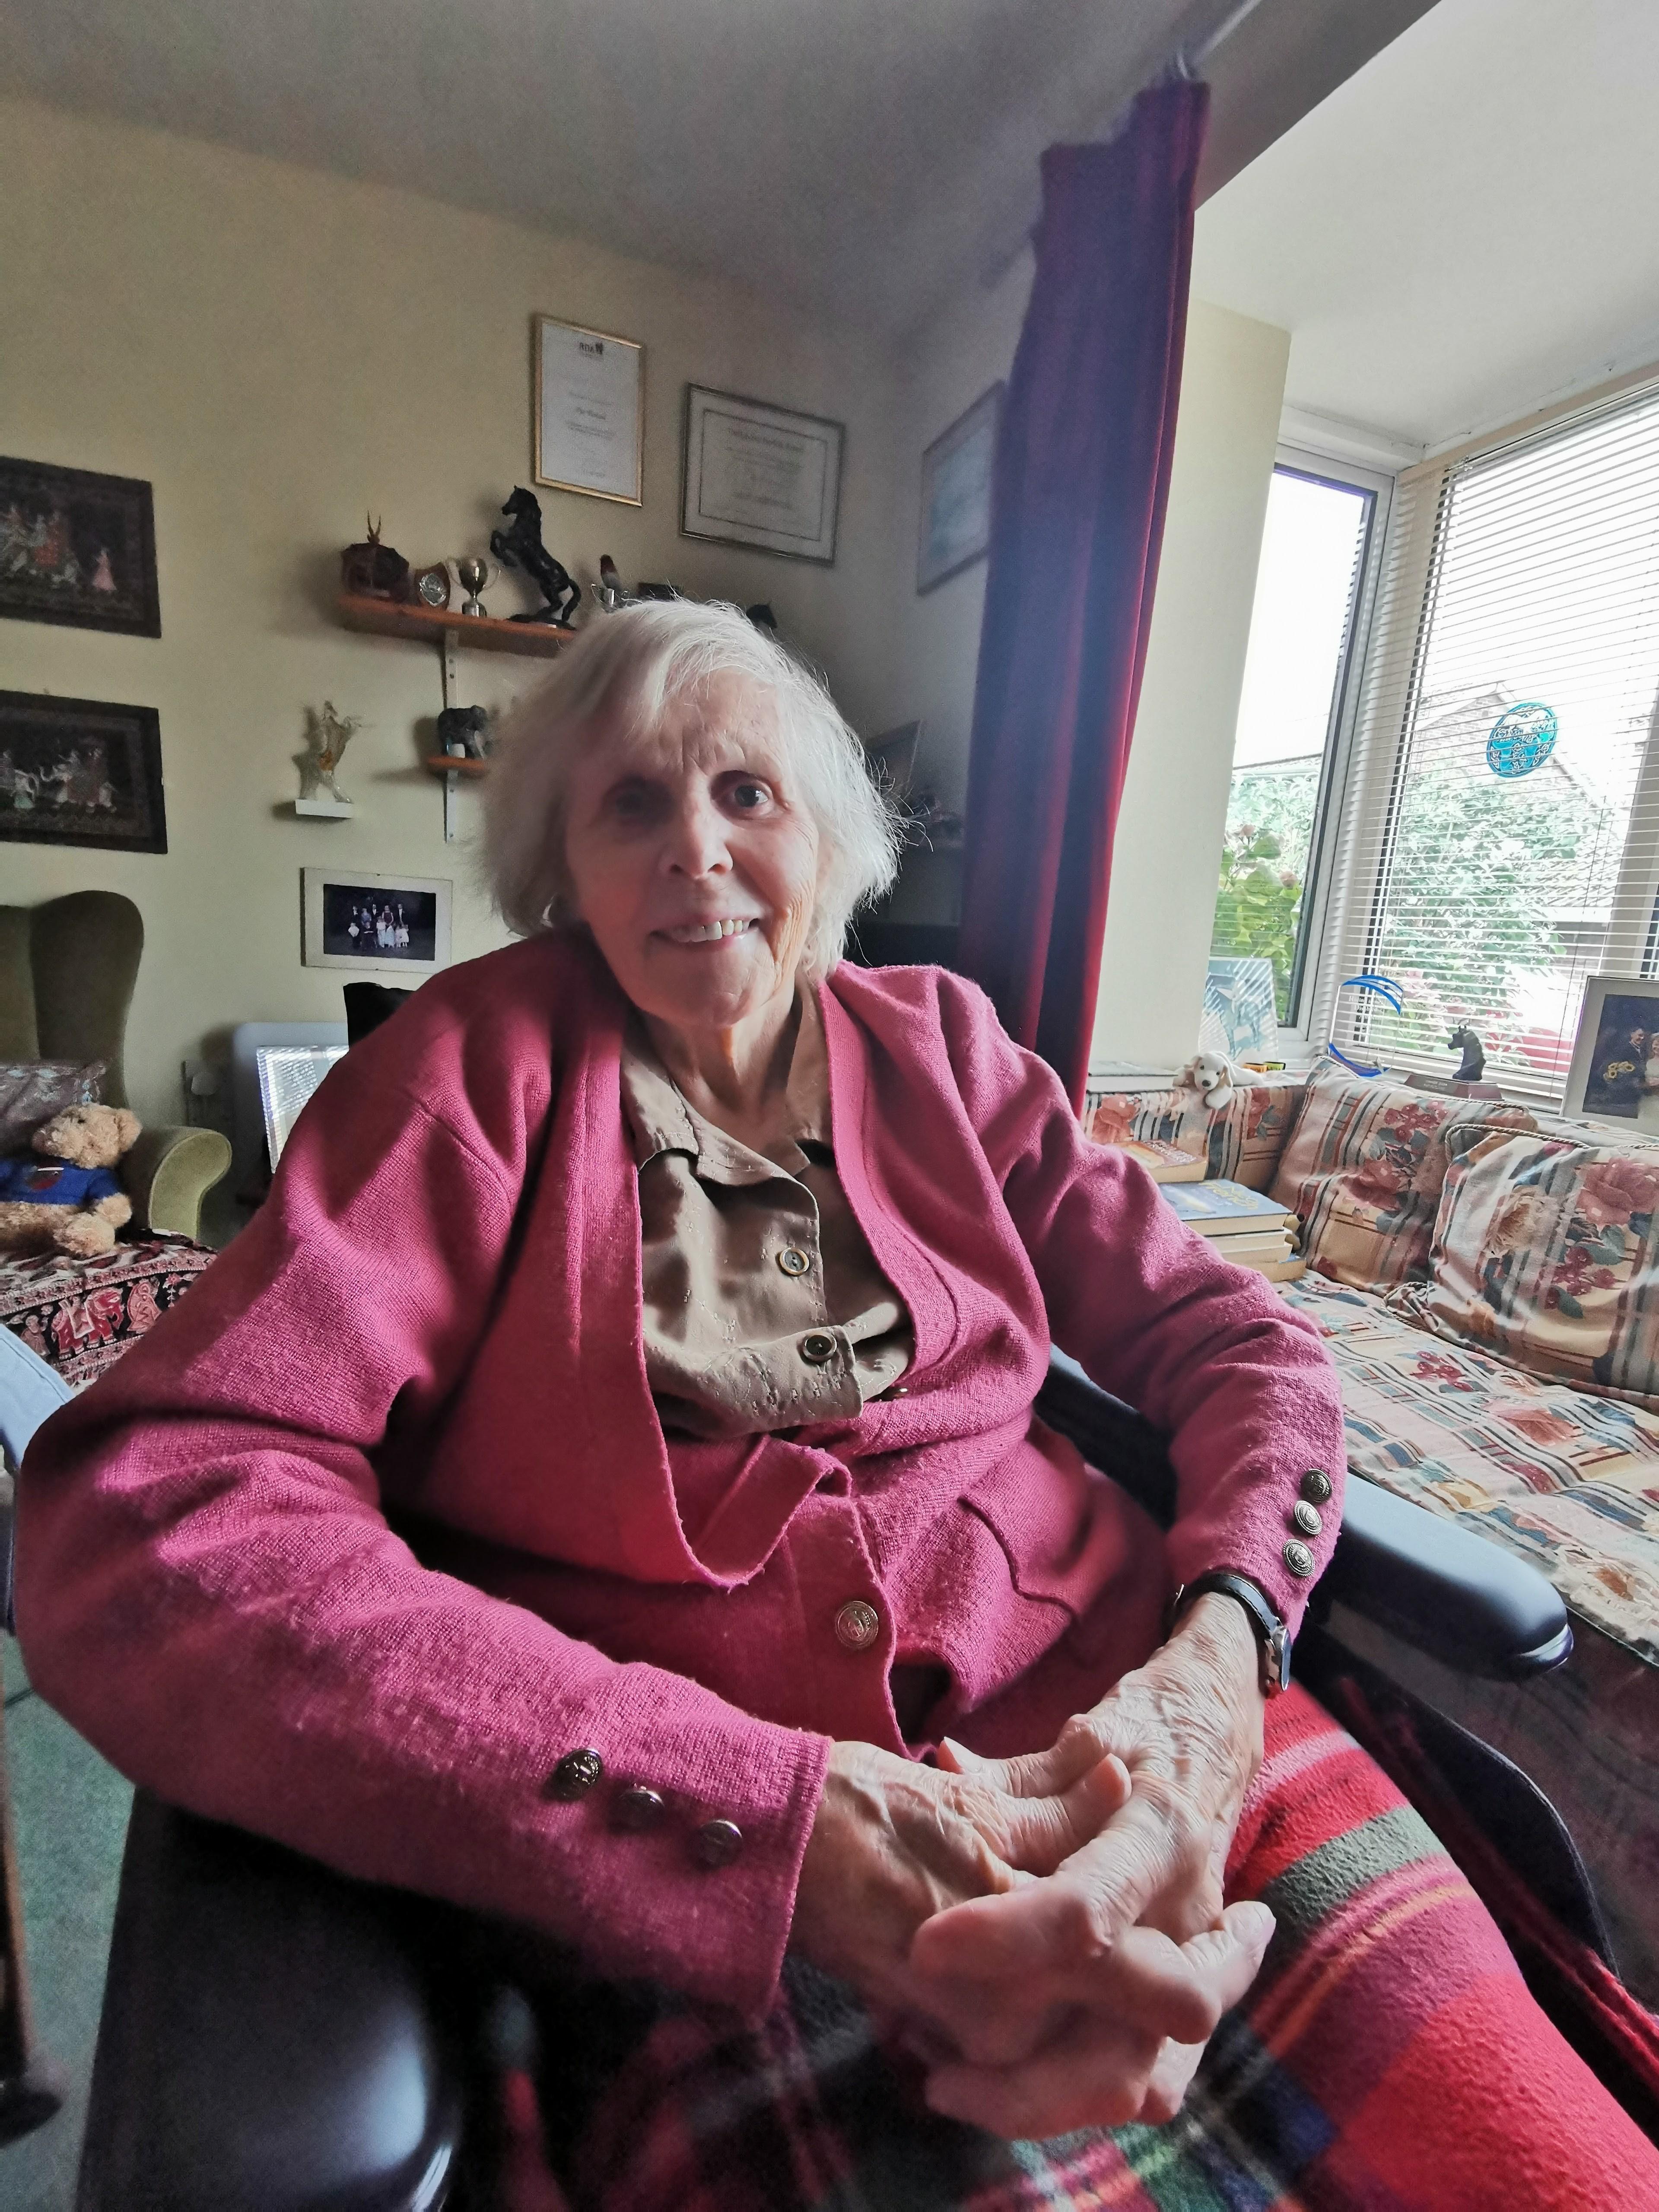 Photo of the story teller